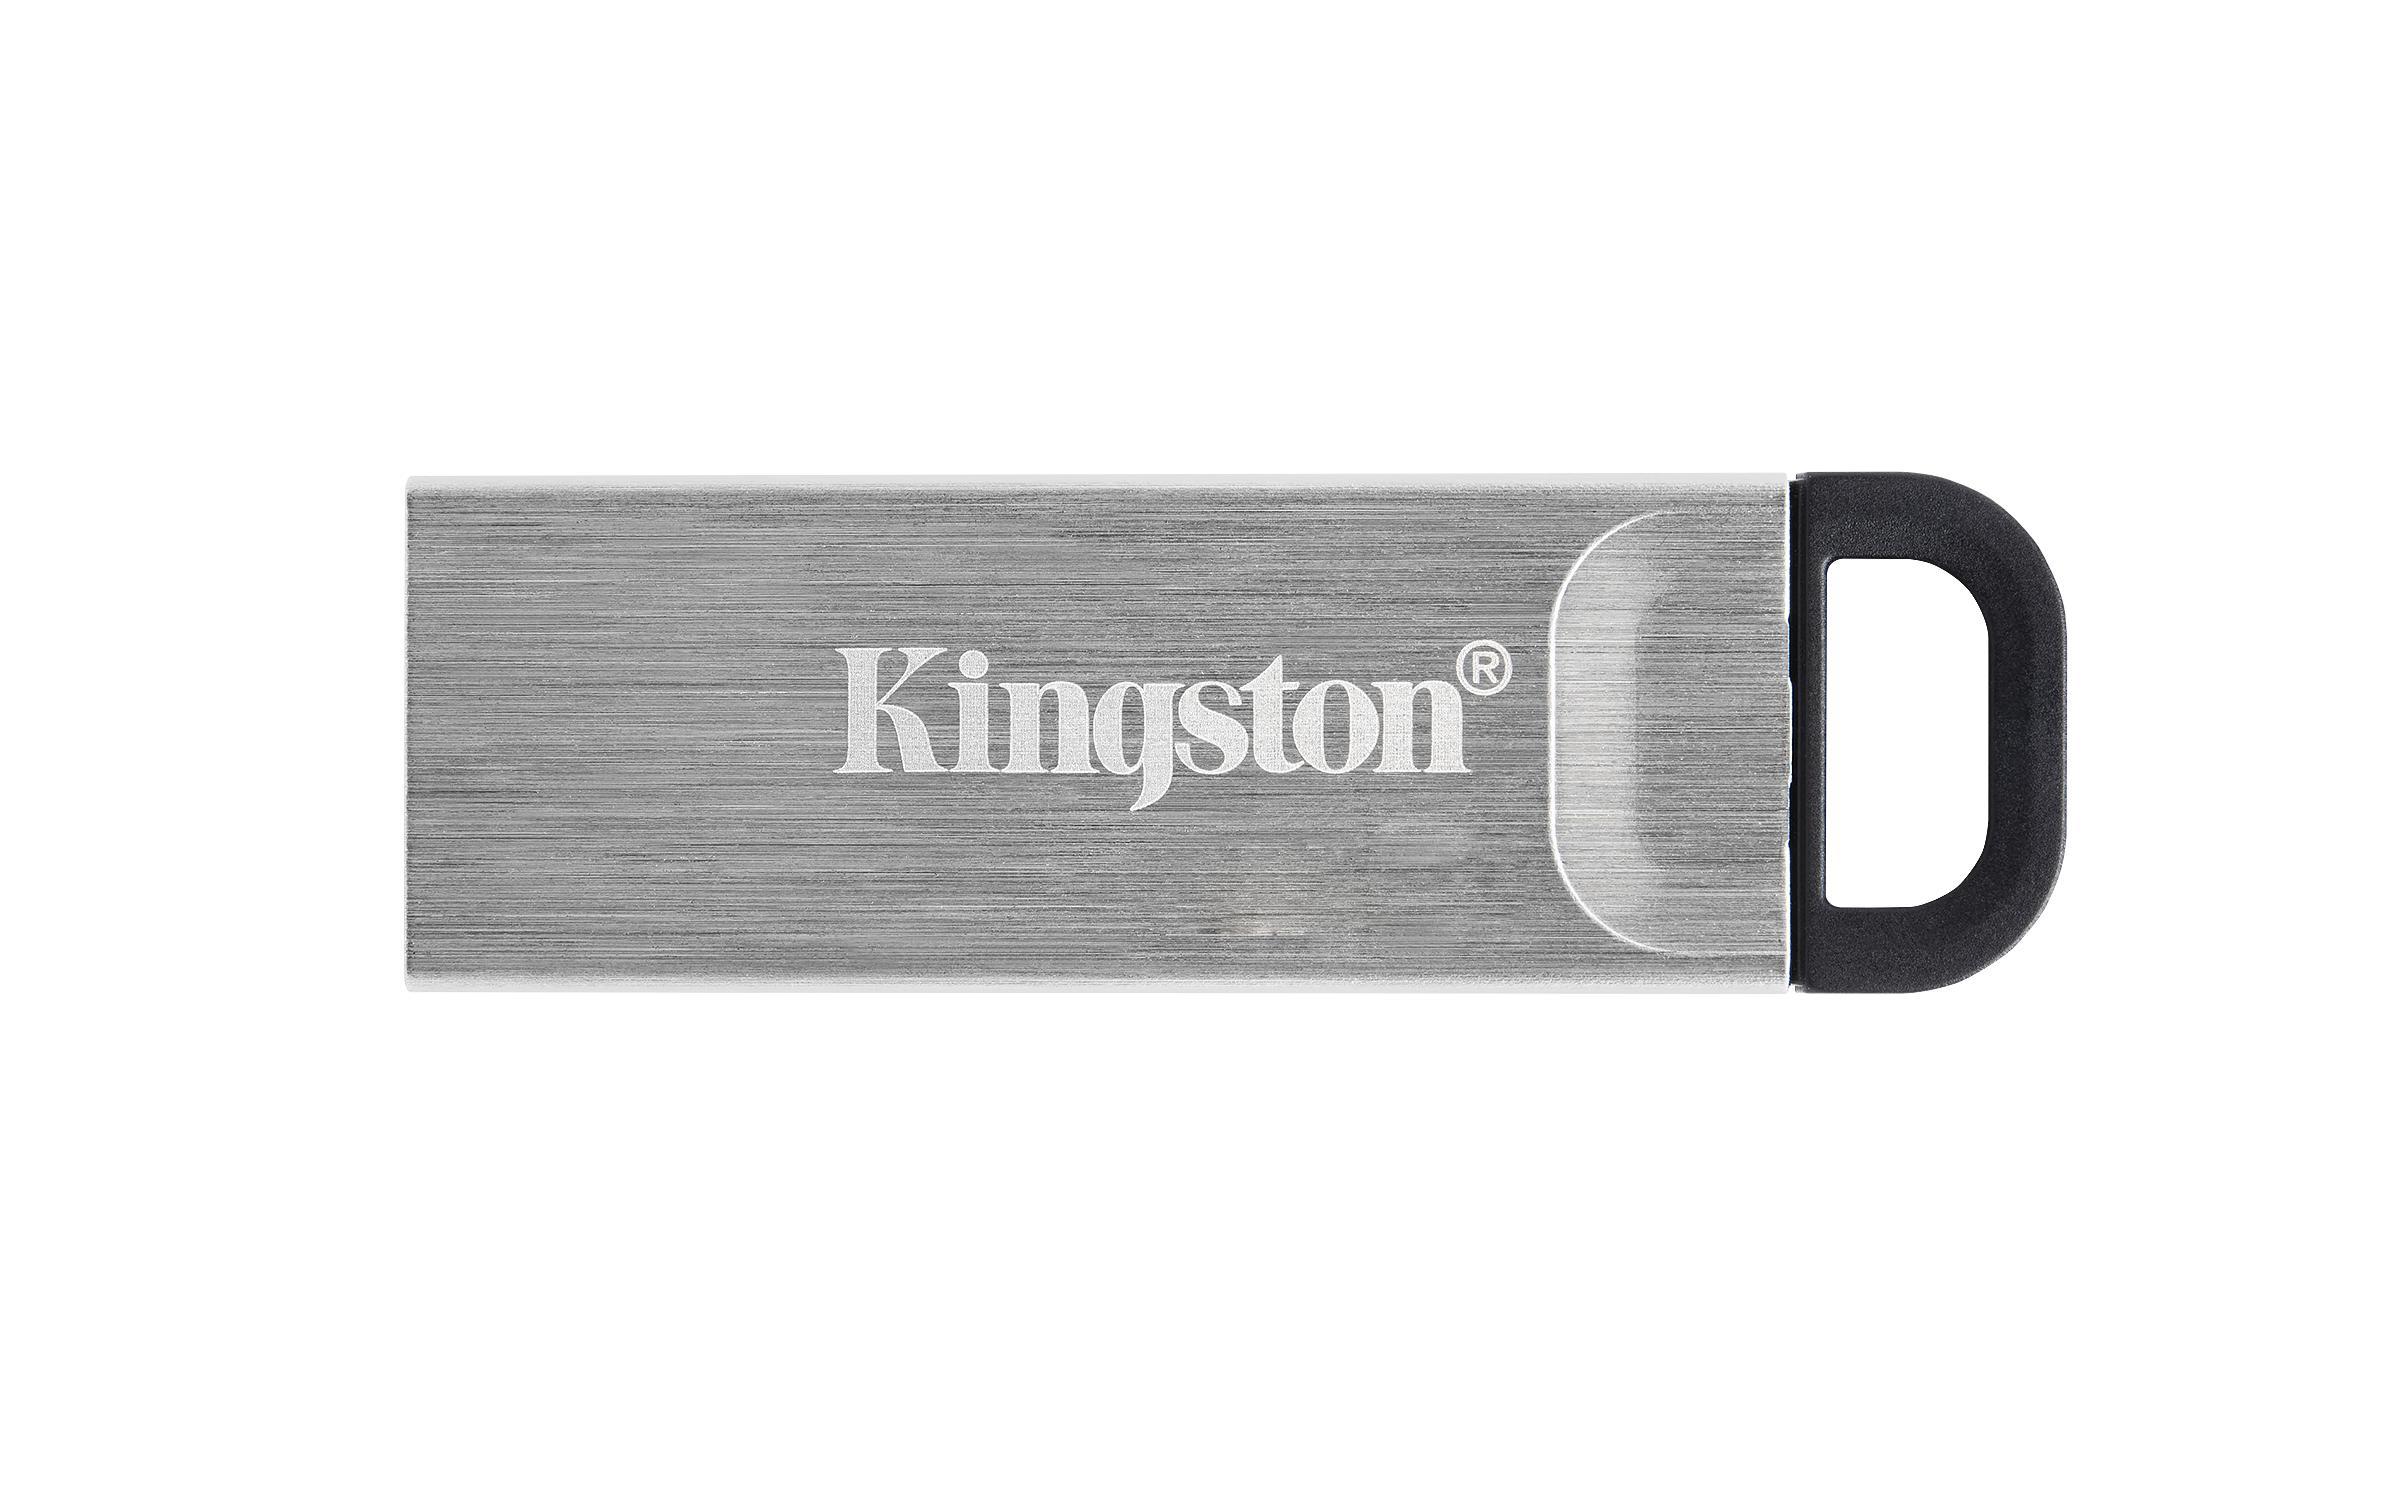 USB памет KINGSTON DataTraveler Kyson 32GB, USB 3.2 Gen 1, Сребрист